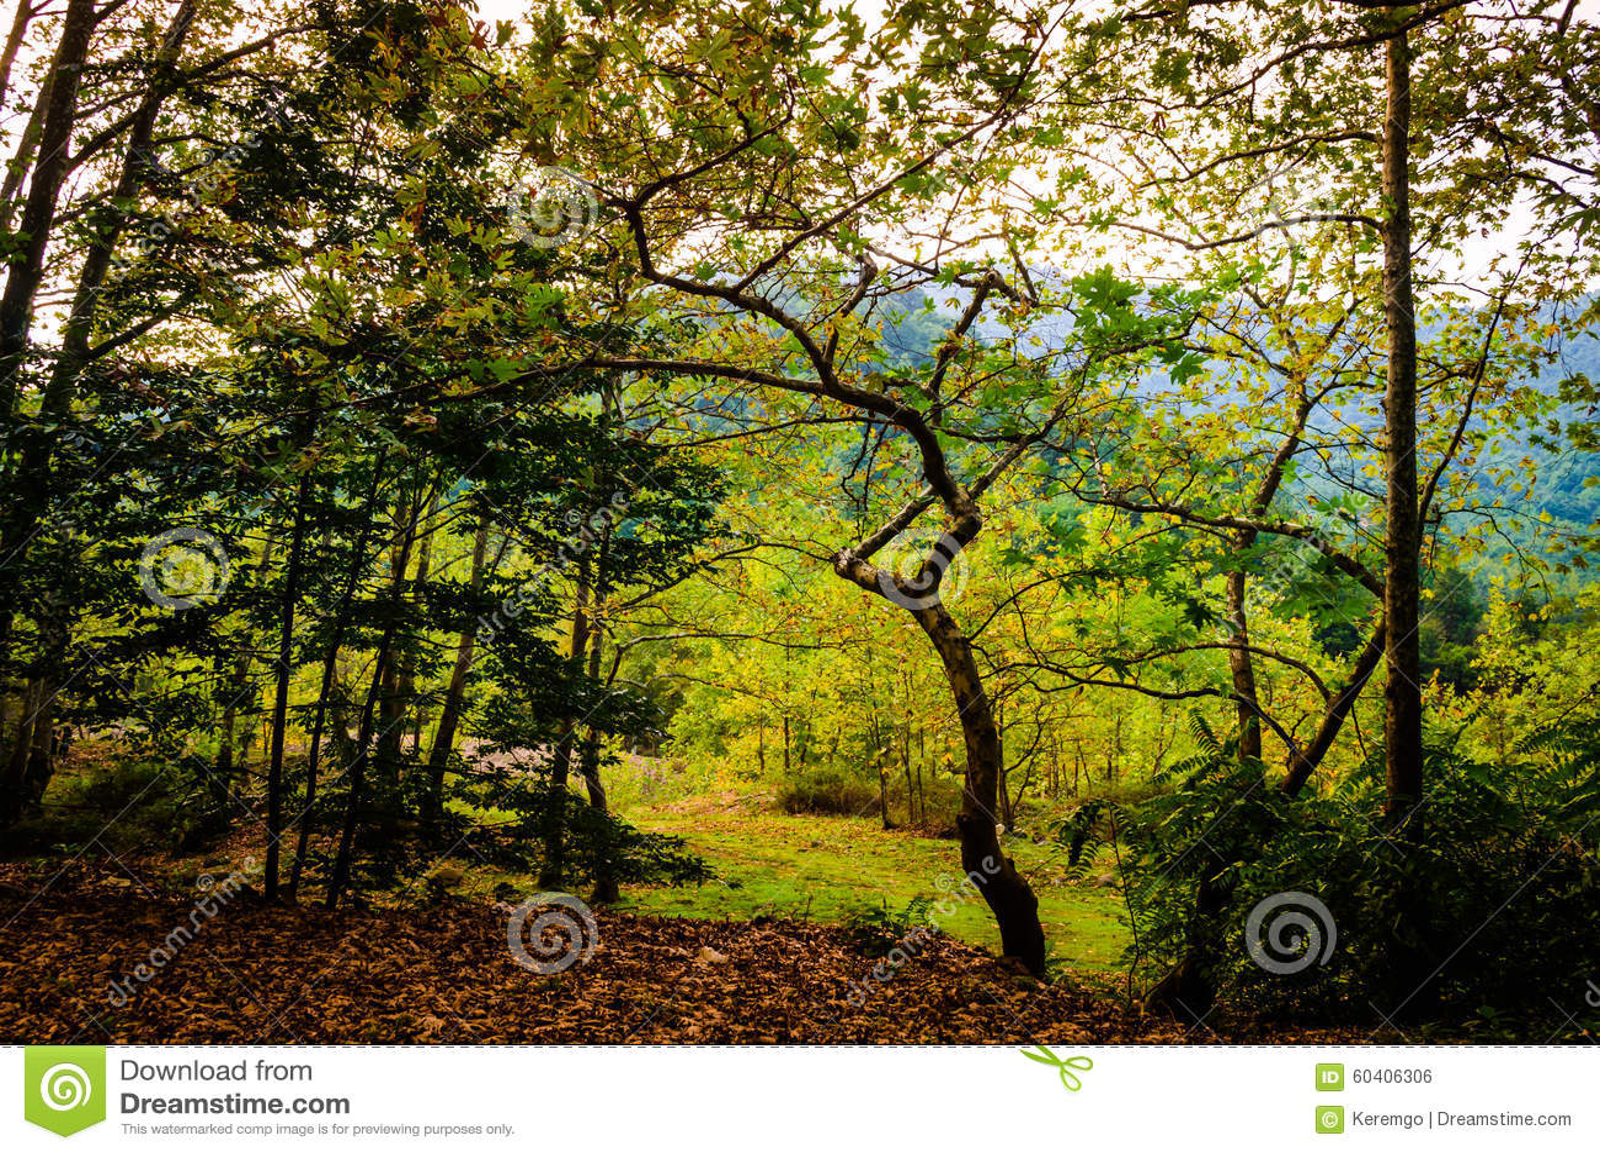 Autumn Forest Of Aegean Region